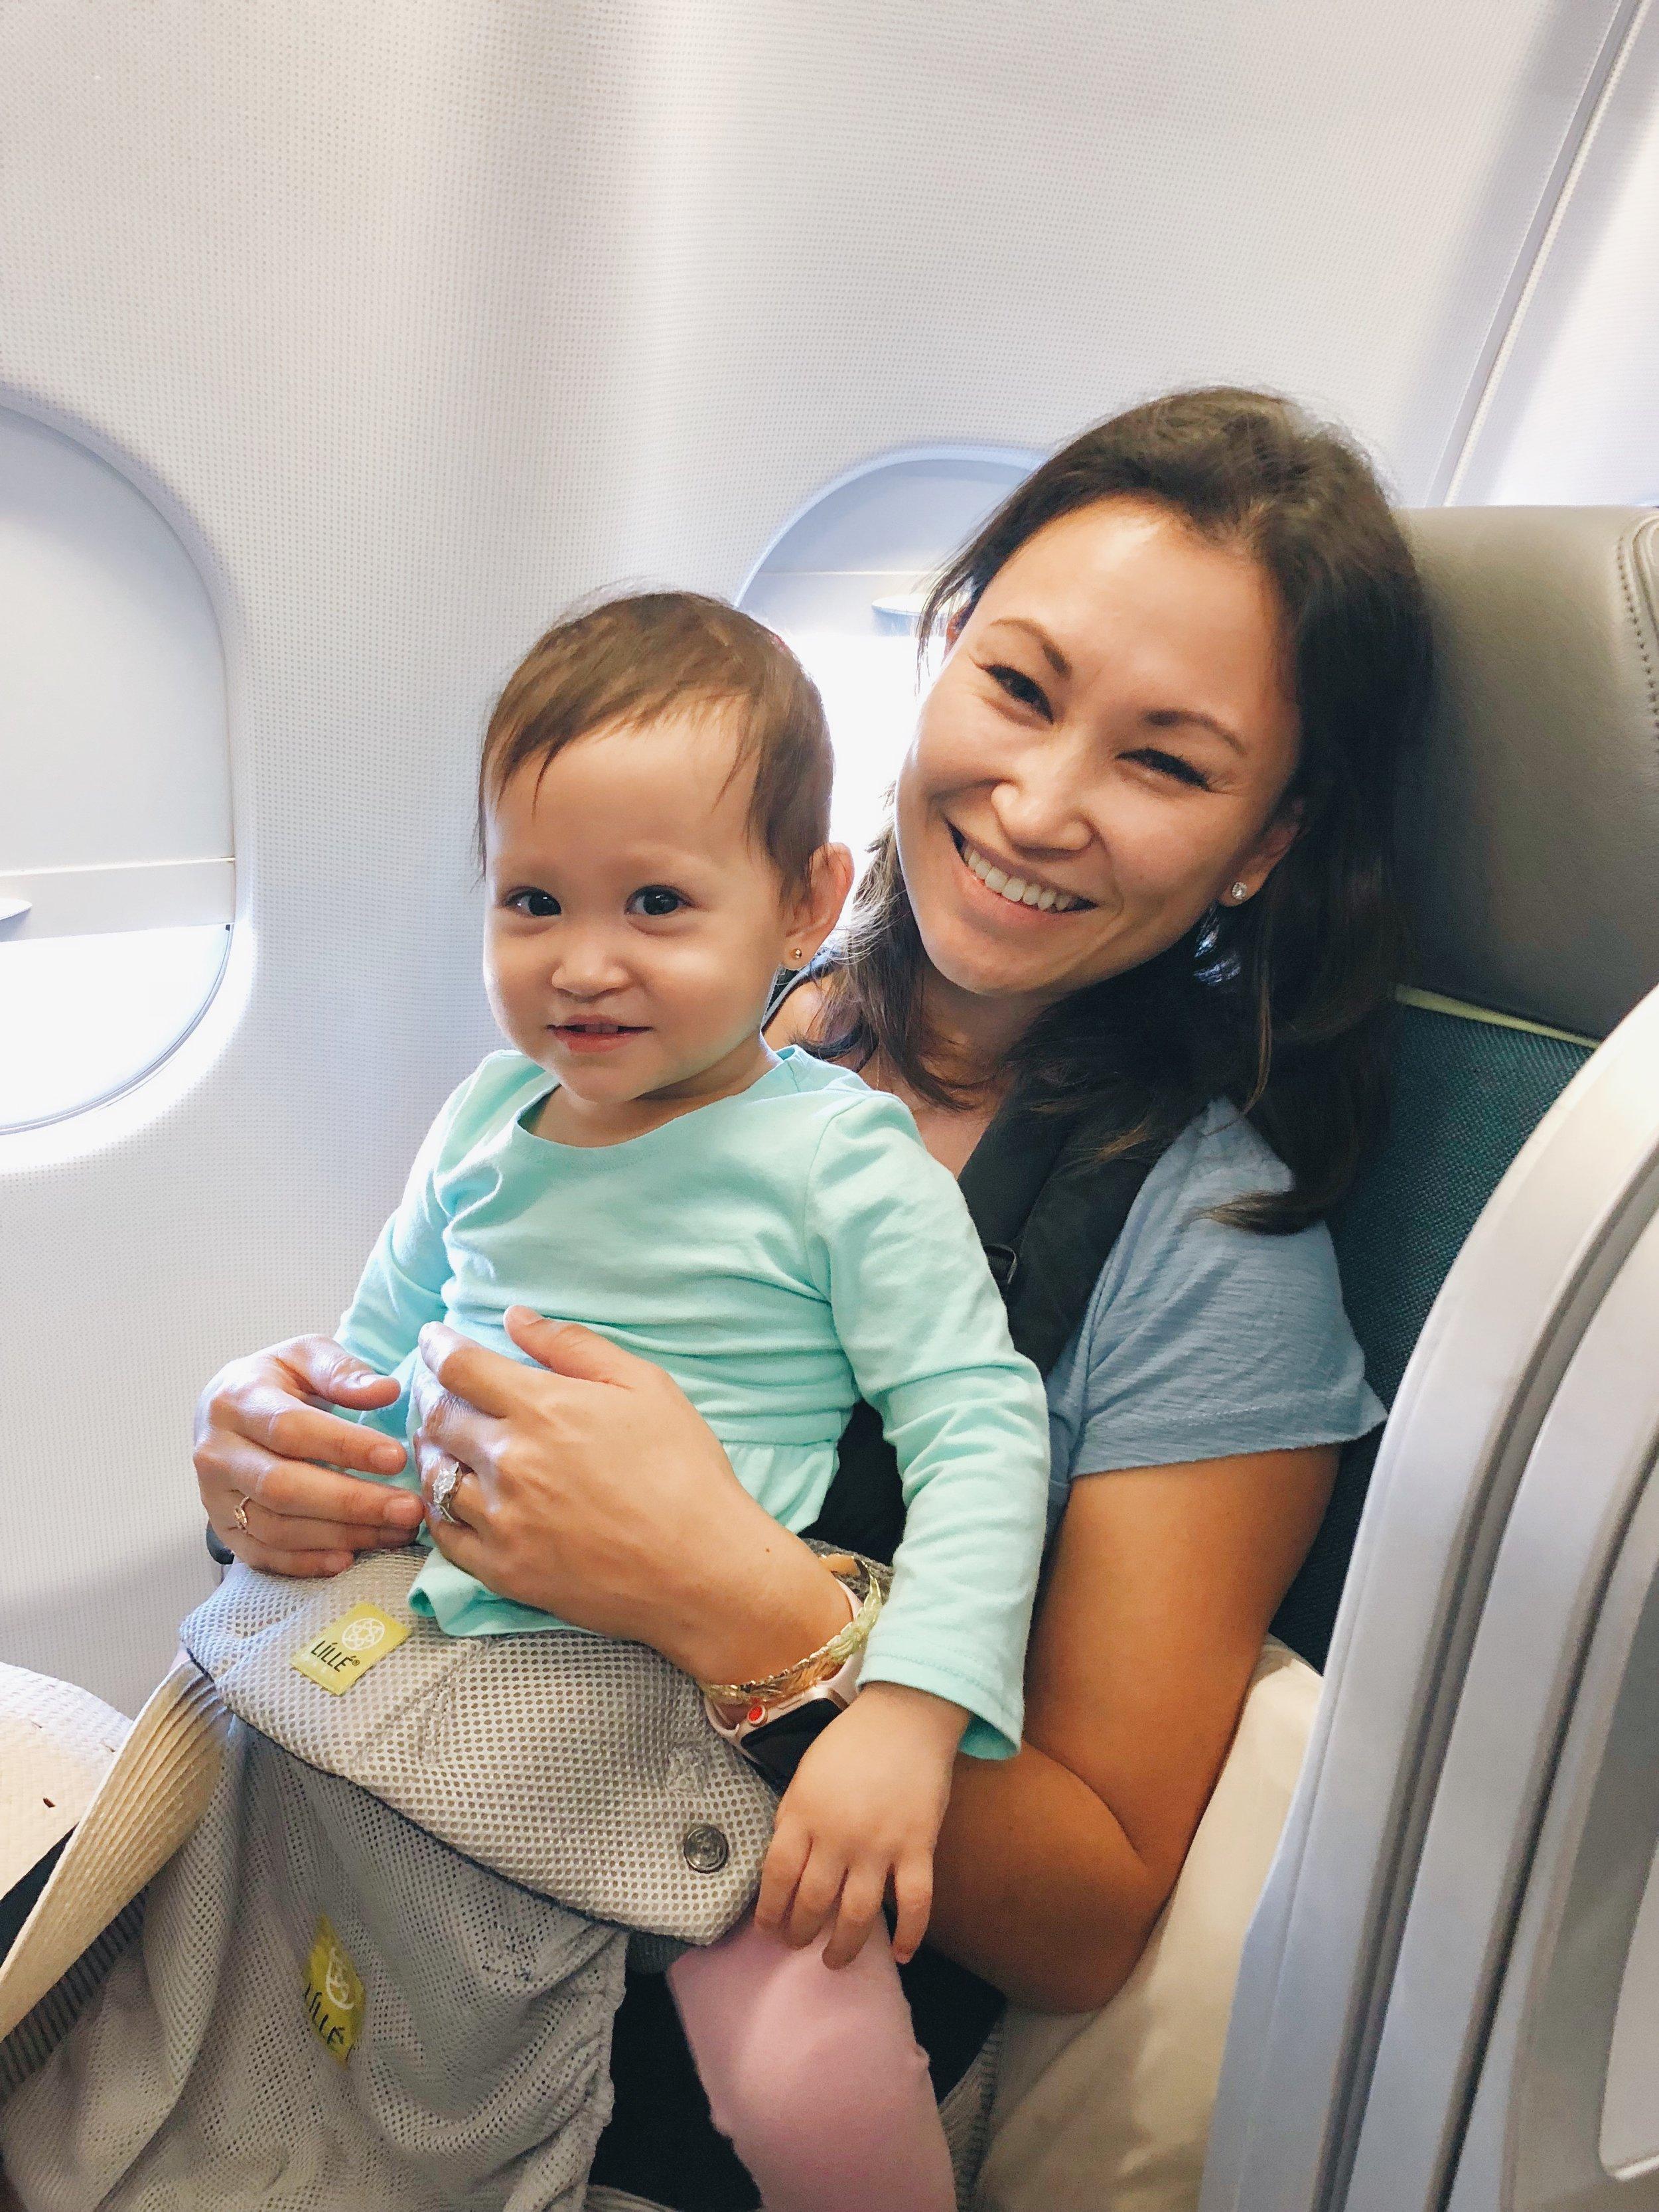 Aer Lingus Business Class lap baby